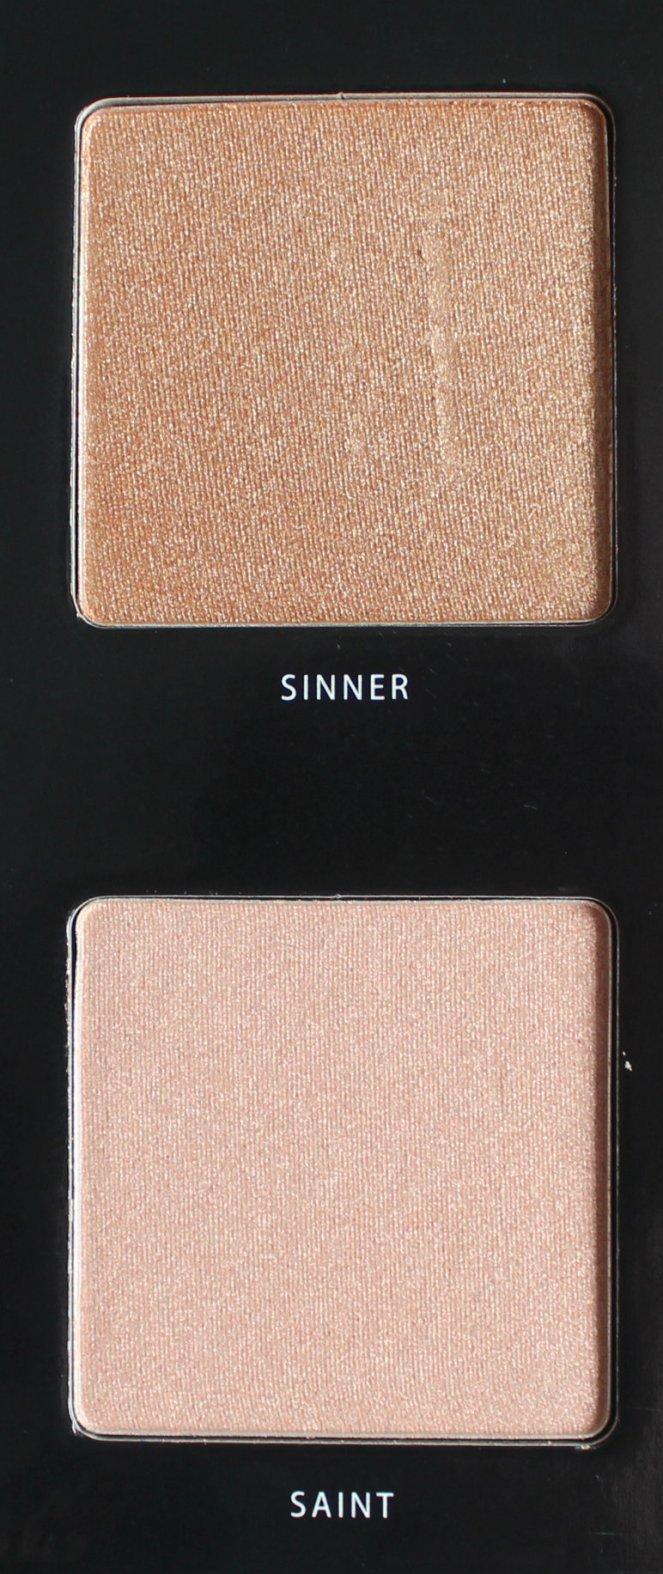 BPerfect Cosmetics x Stacey Marie Carnival Palette Sinner Saint